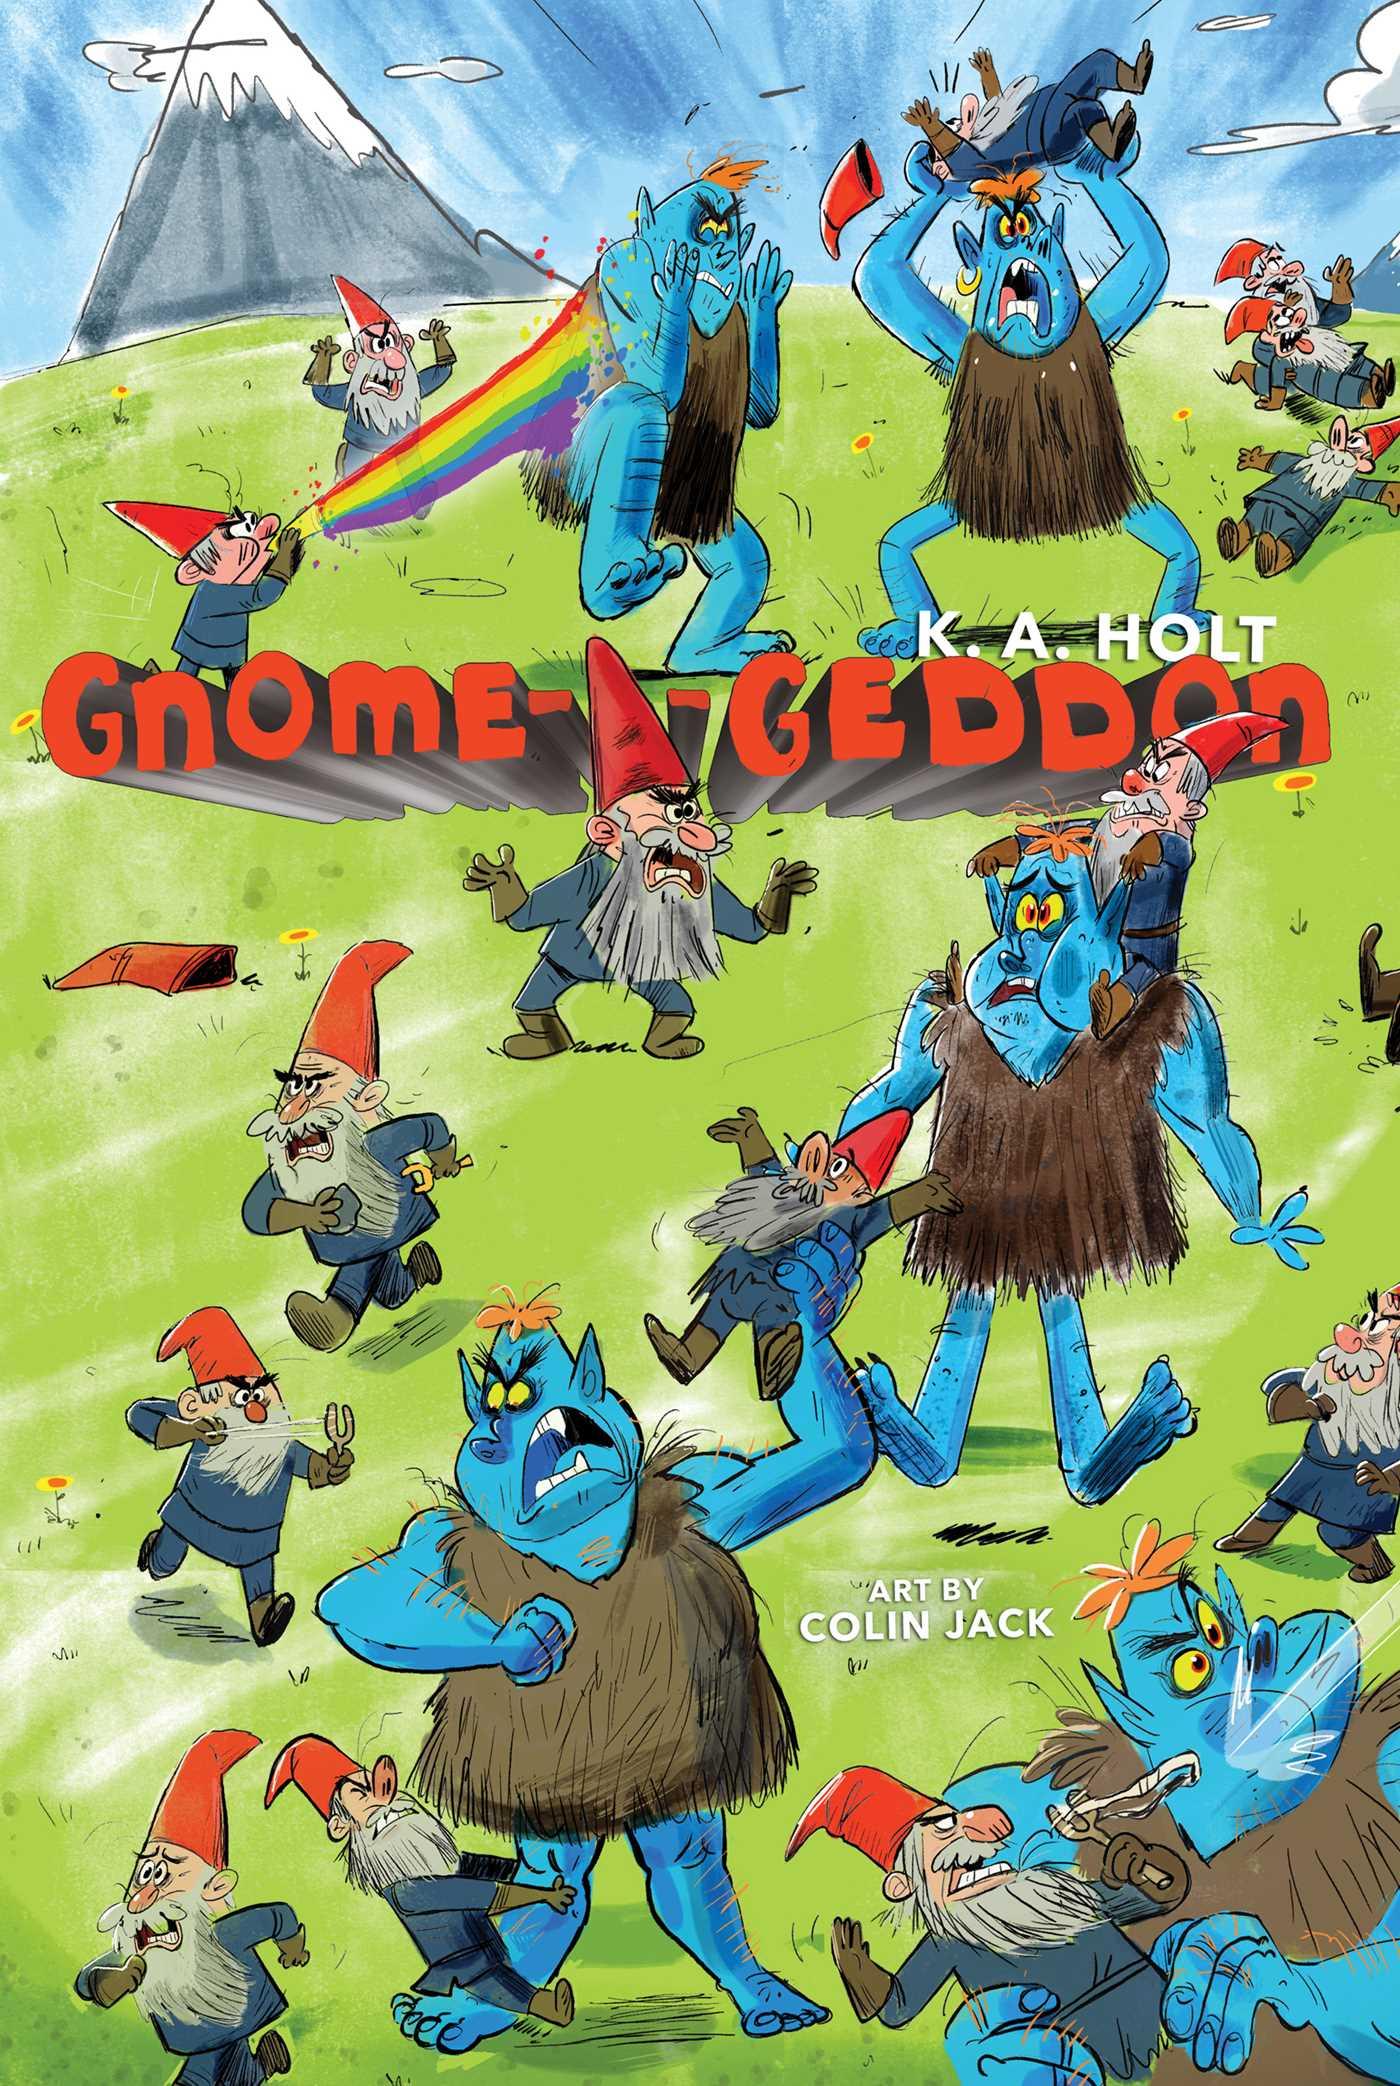 Gnome a geddon 9781481478472 hr